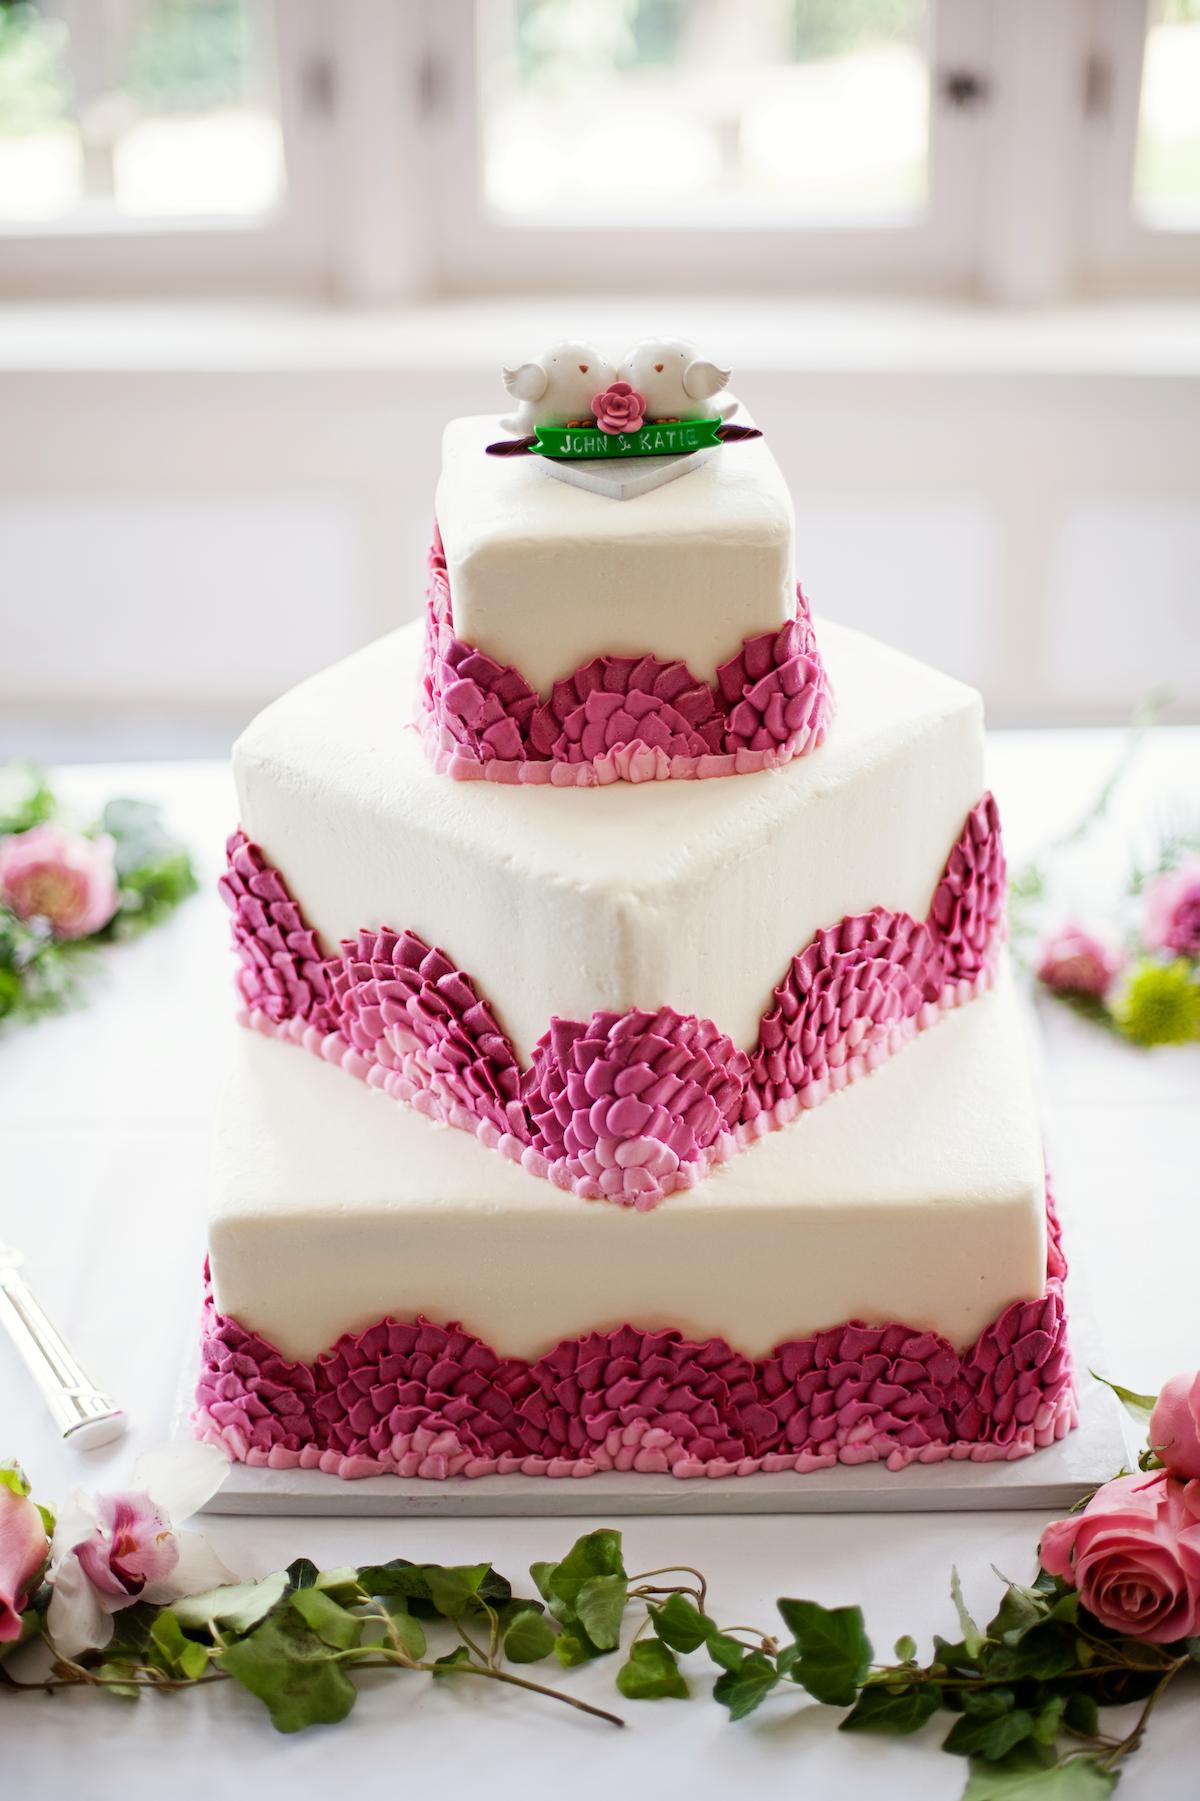 kansas city wedding ombre detail wedding cake personalized cocktail napkins. Black Bedroom Furniture Sets. Home Design Ideas